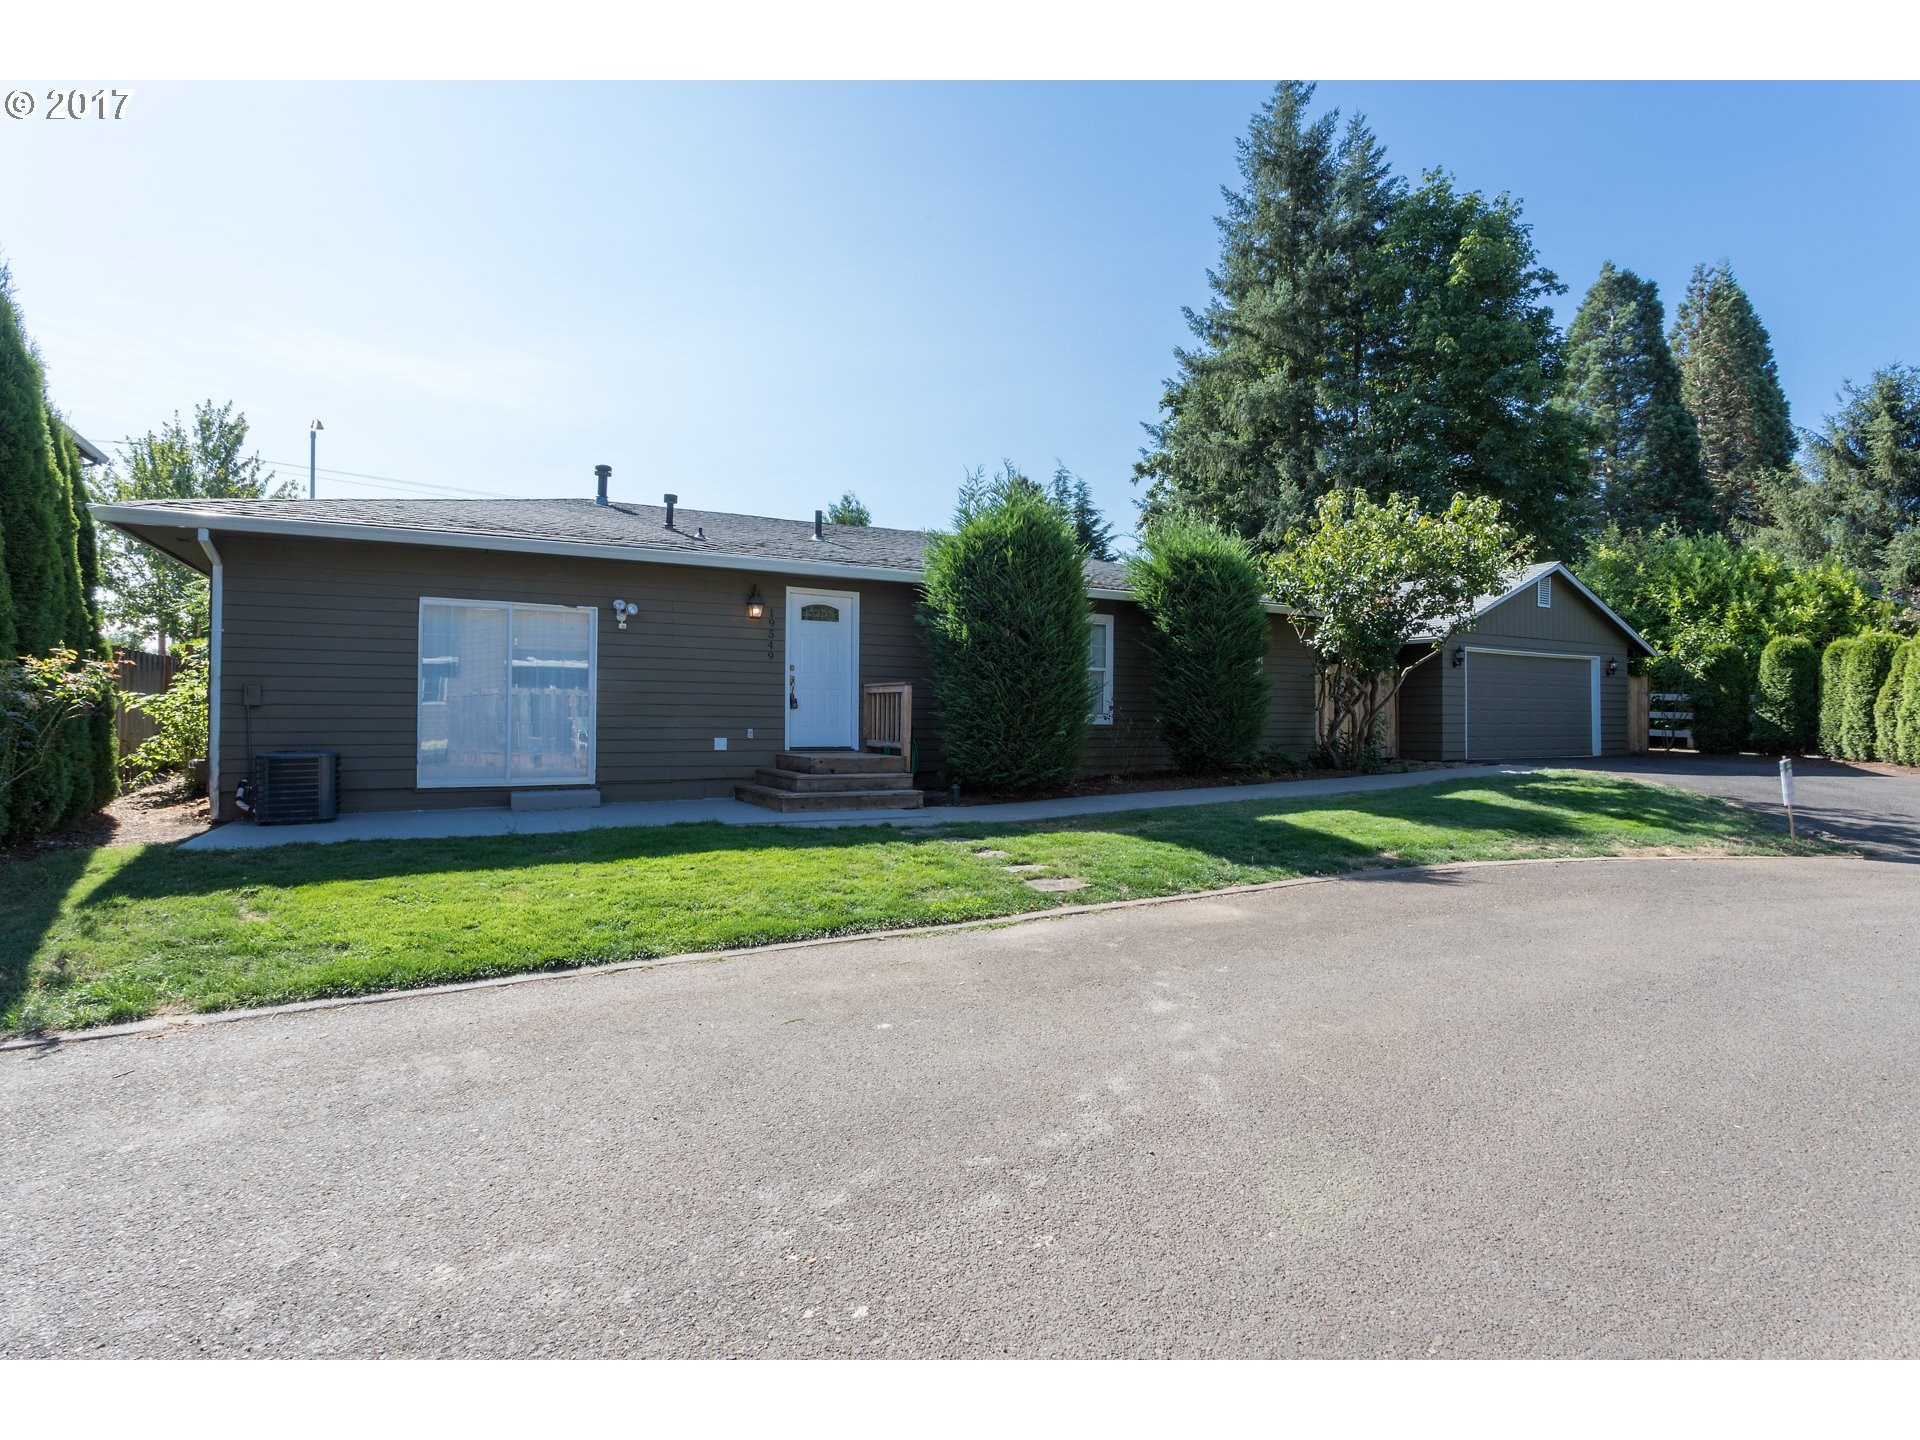 19549 HUMMINGBIRD LOOP, Oregon City, OR 97045